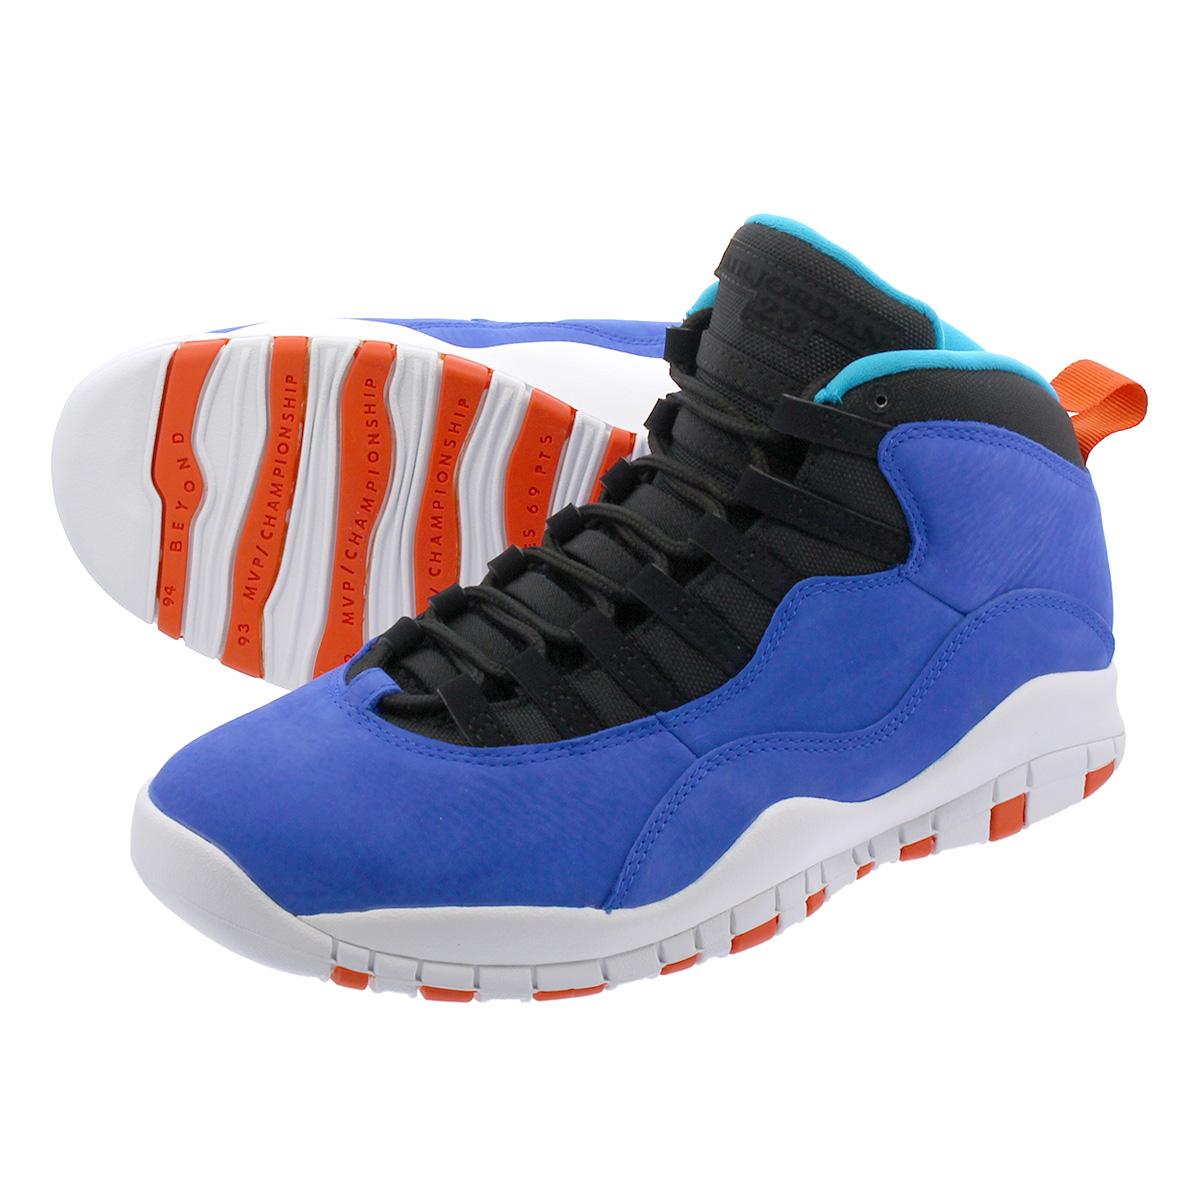 "AIR JORDAN 10 RETRO TINKER /""HUARACHE LIGHT/"" 310805-408 Racer Blue Team Orange"